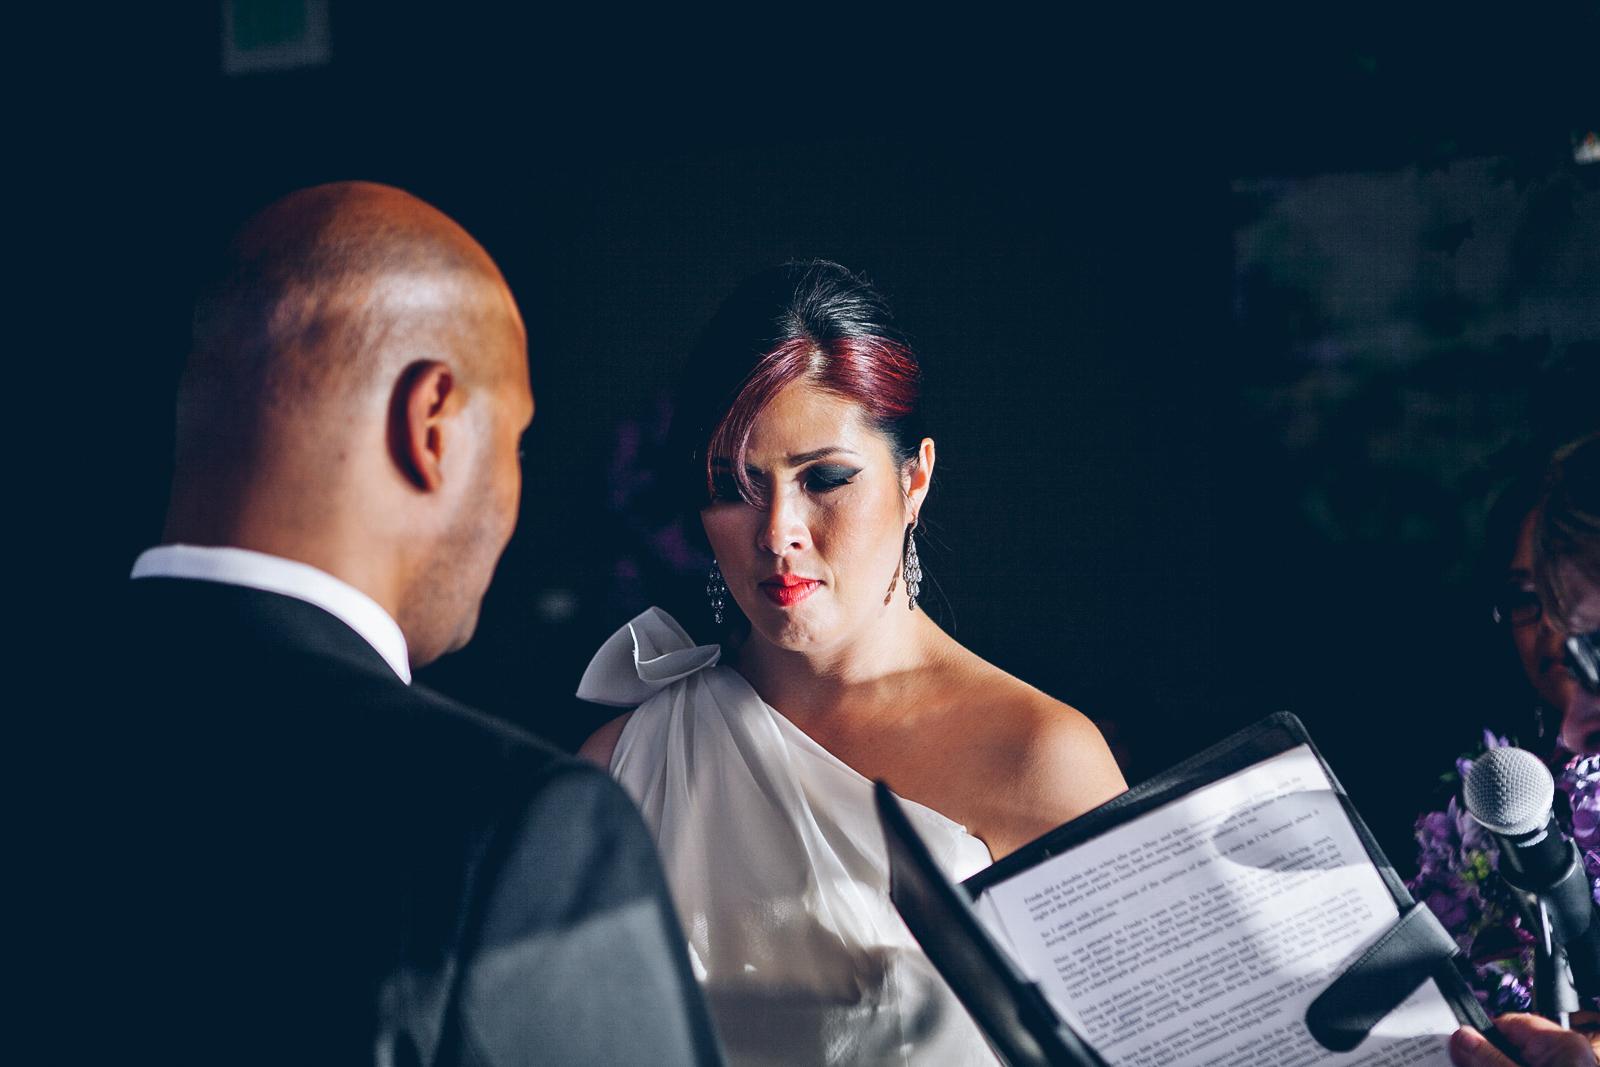 greens_restaurant_wedding_photography_san_franscisco_ebony_siovhan_bokeh_photography_38.jpg